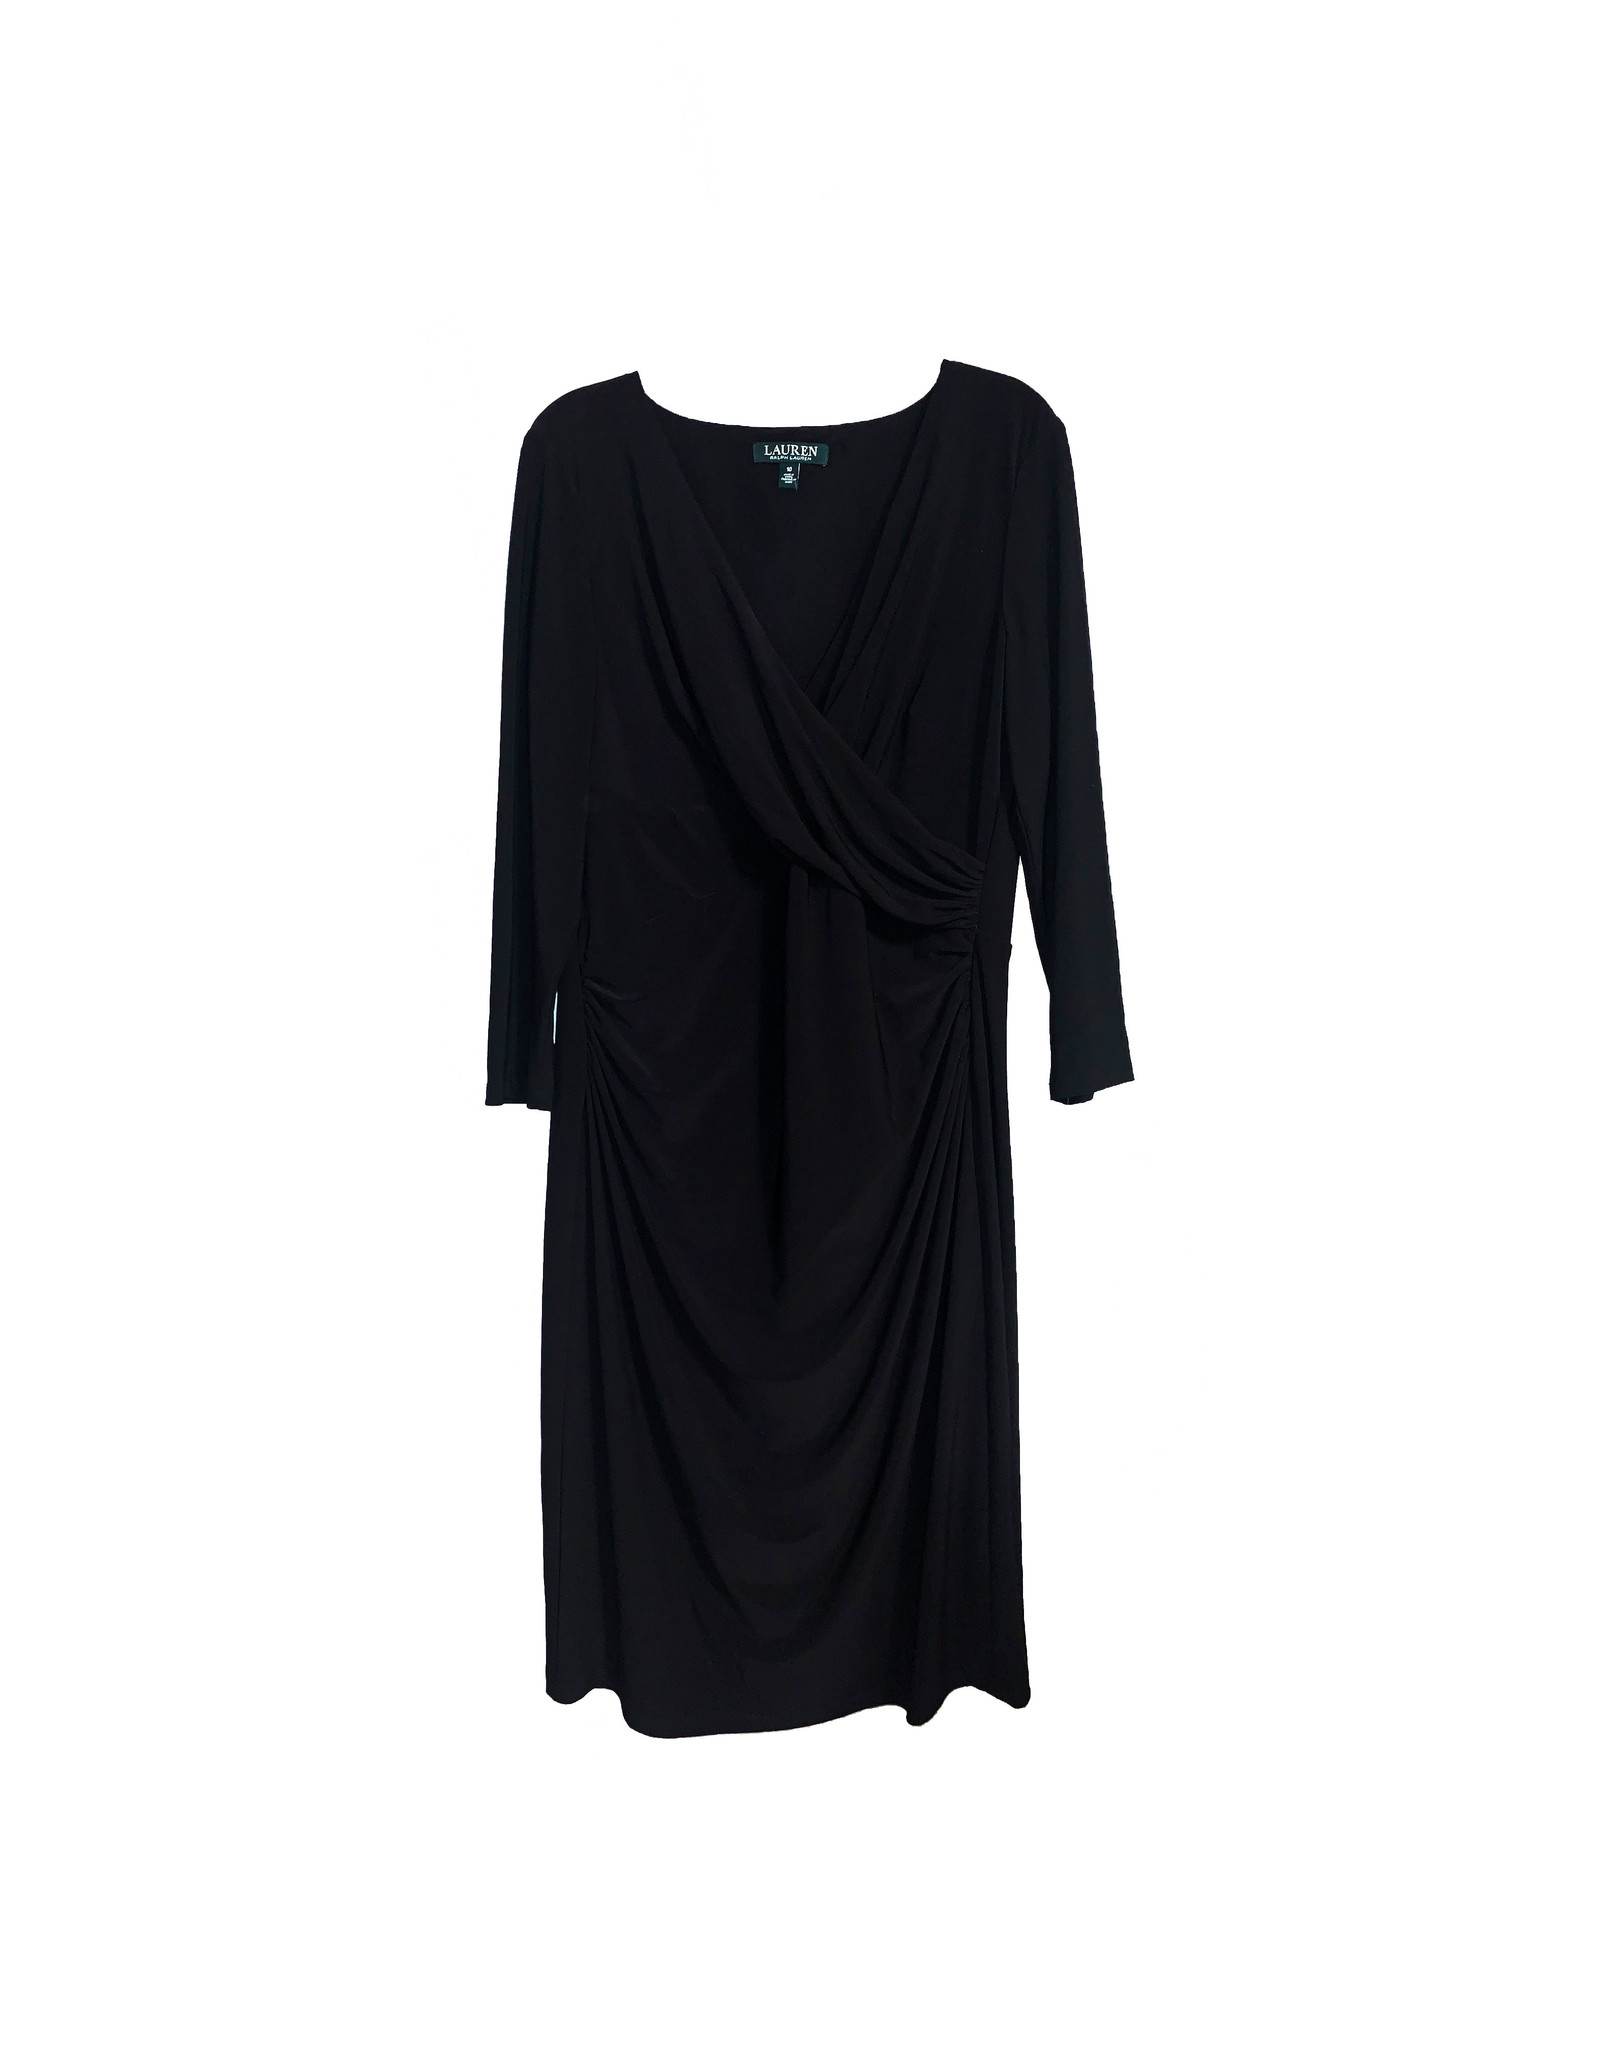 LAUREN RALPH LAUREN LAUREN RALPH LAUREN Ruched V-Neck Dress